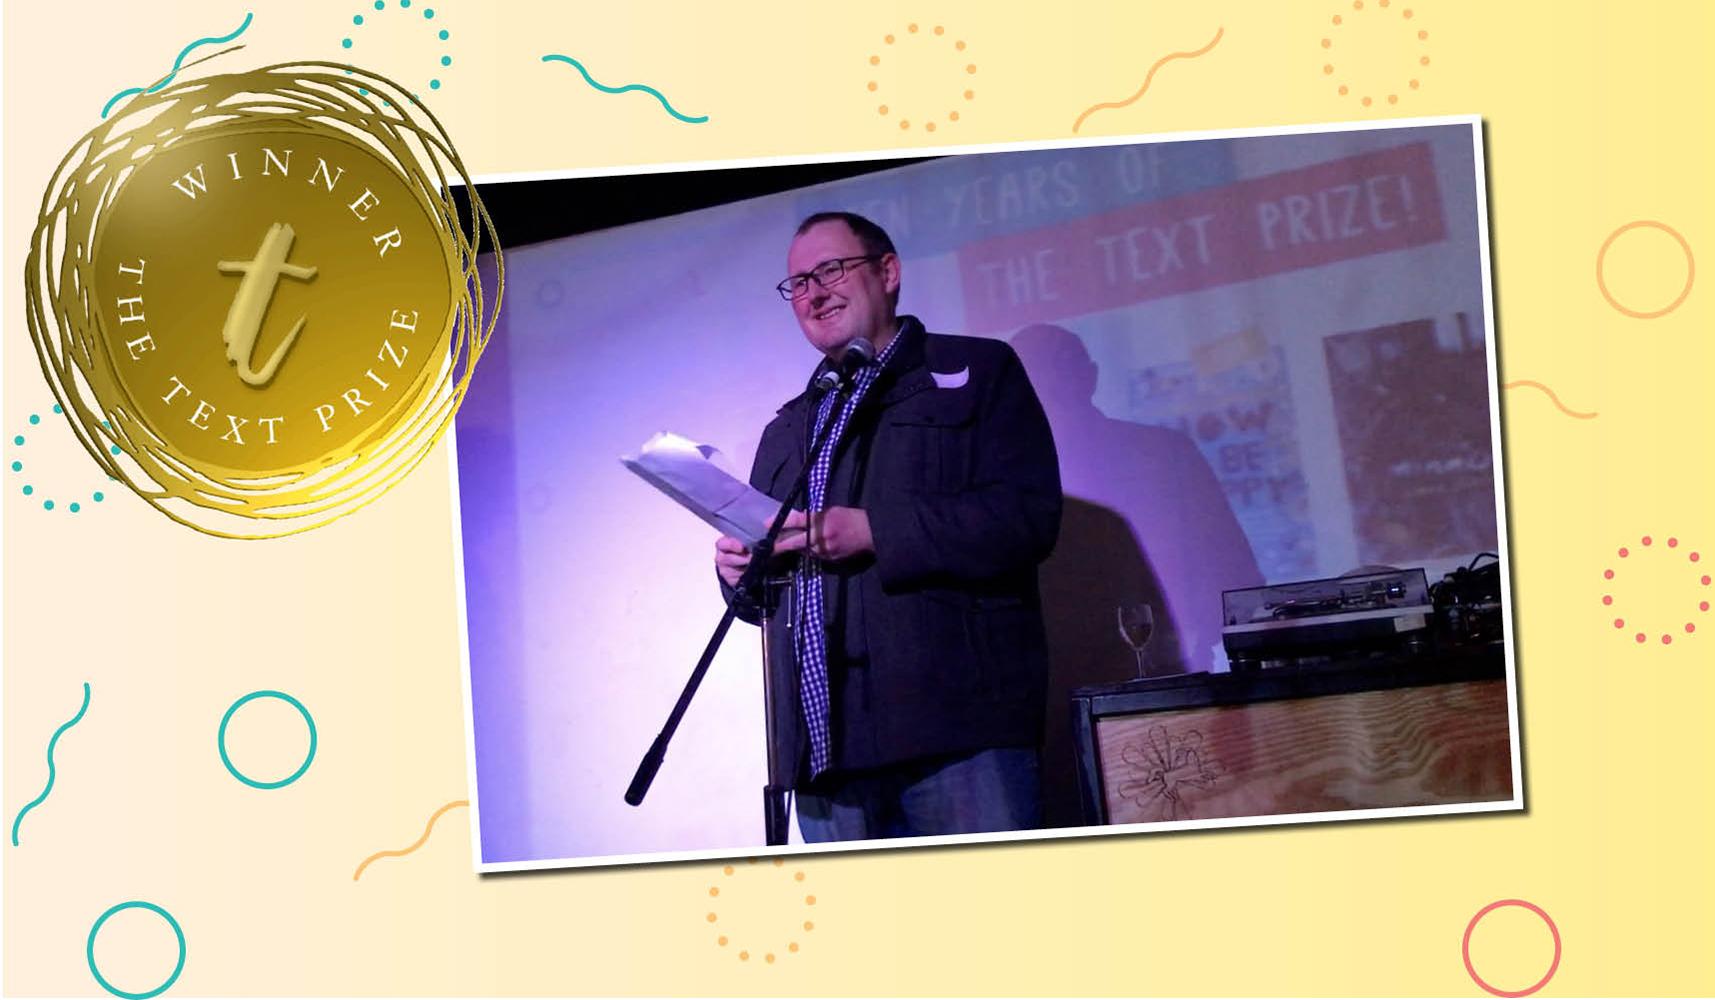 Adam Cece Winner of the 2017 Text Prize